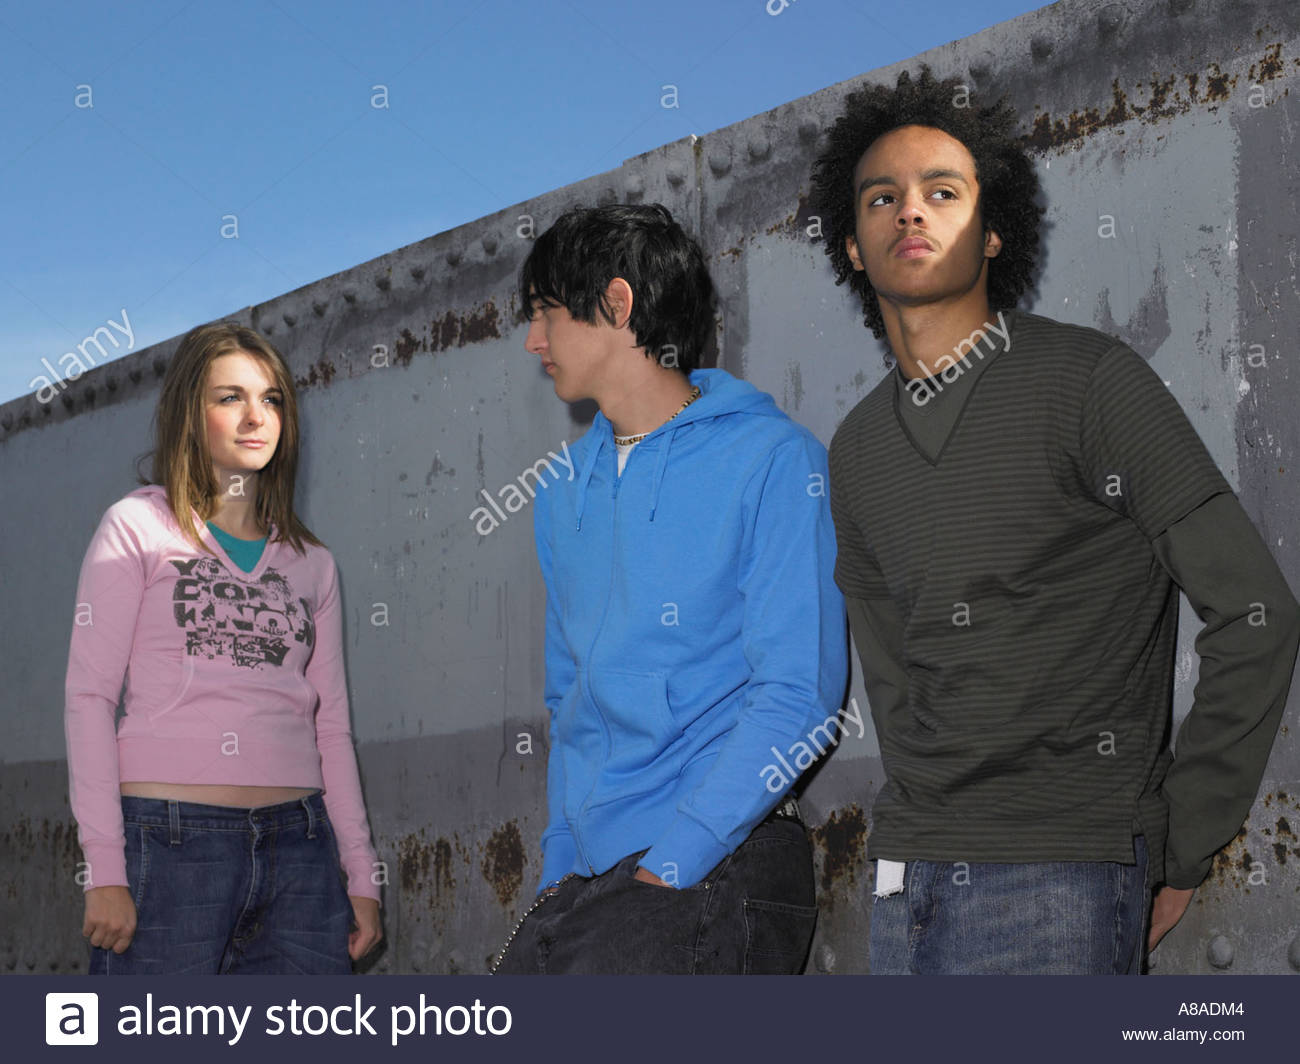 Three teenagers in urban location - Stock Image